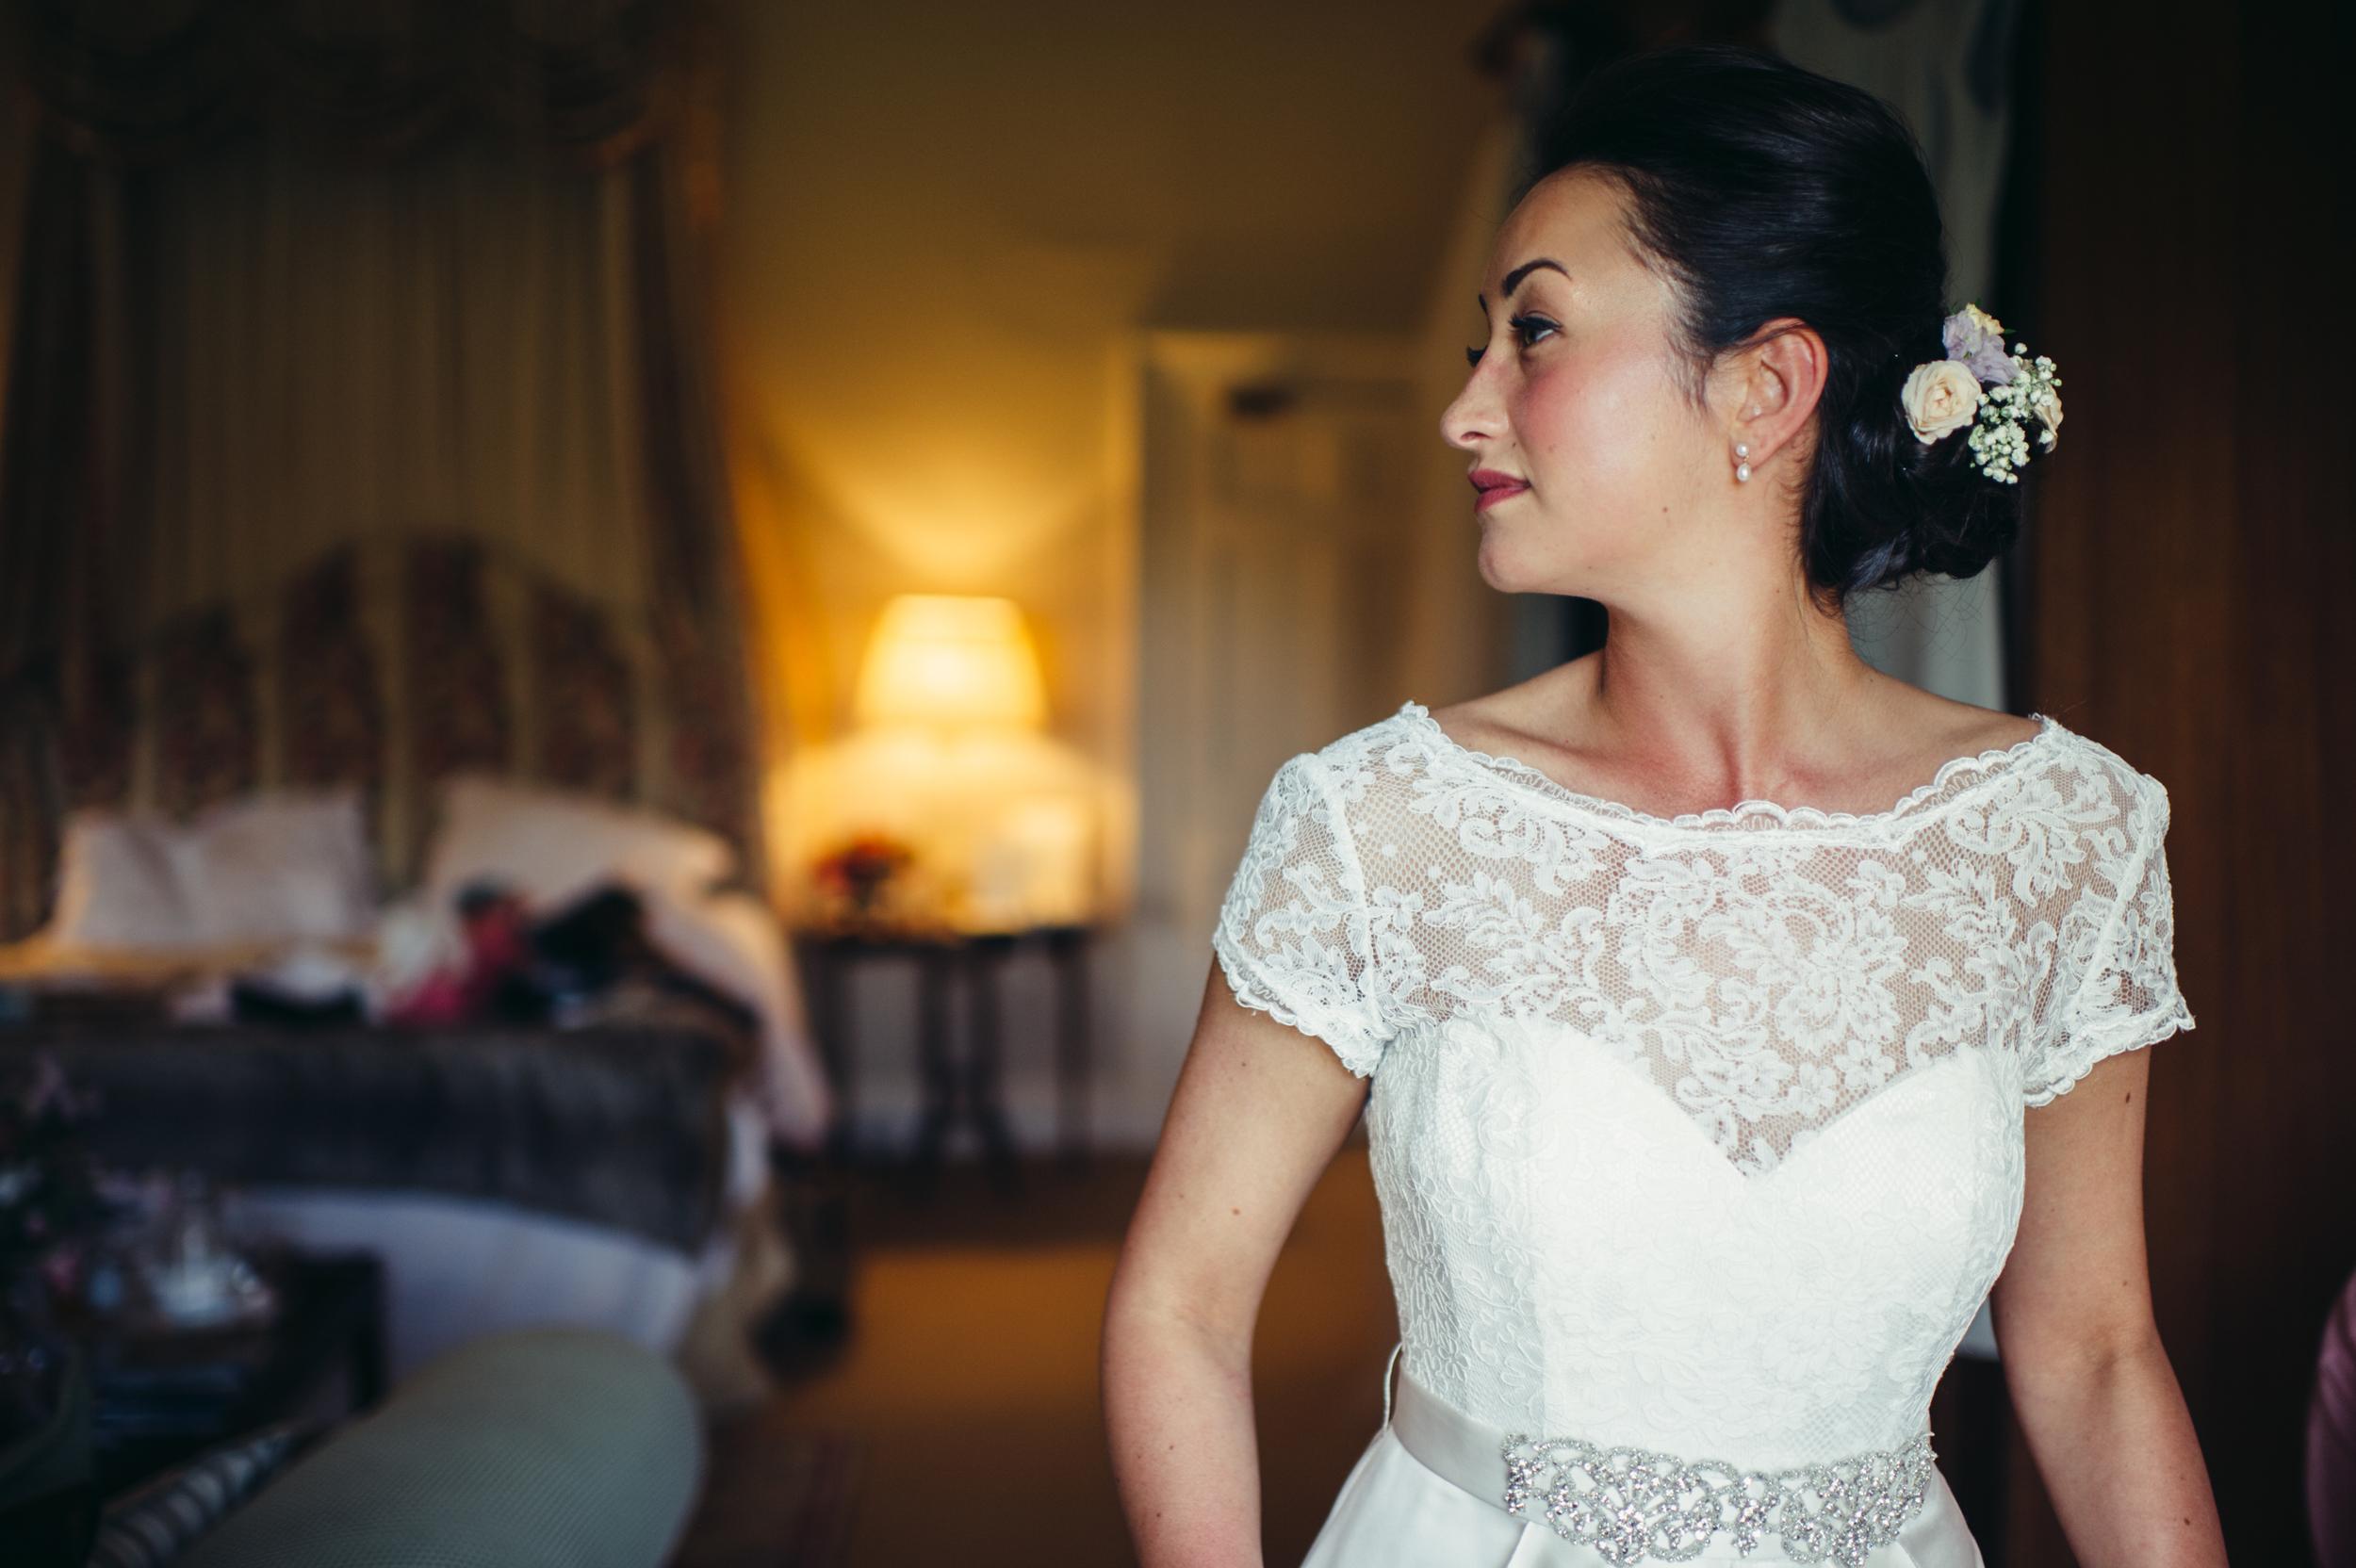 0068-lisa-devine-alternative-creative-wedding-photography-glasgow-edinburgh.JPG